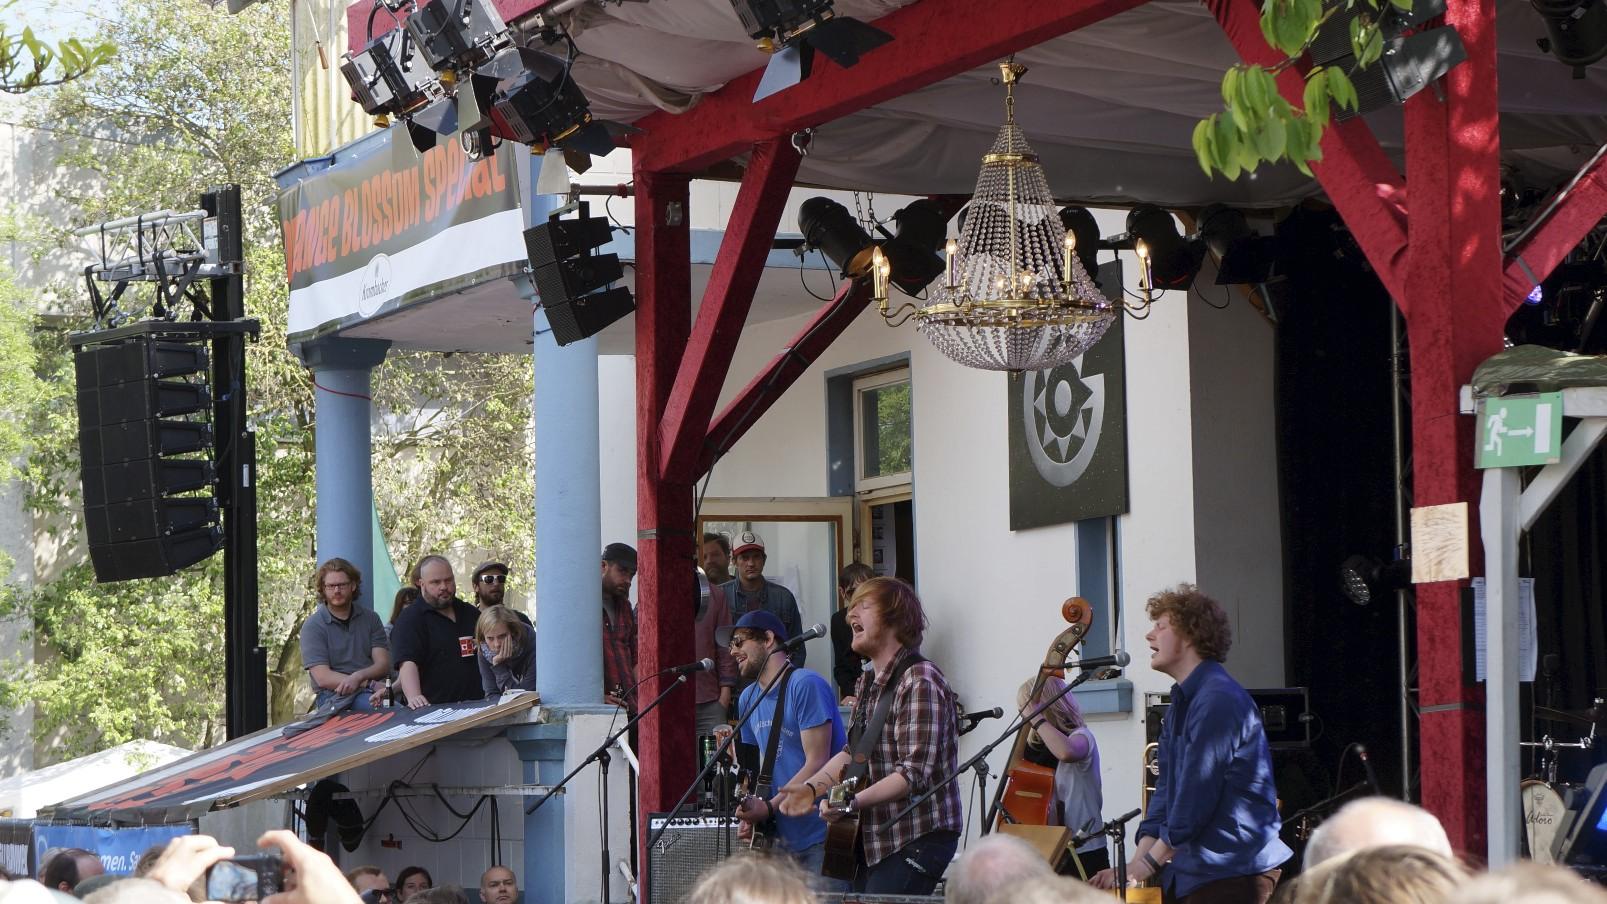 Orange Blossom Spezial Festival in Beverungen am 19.5.2013